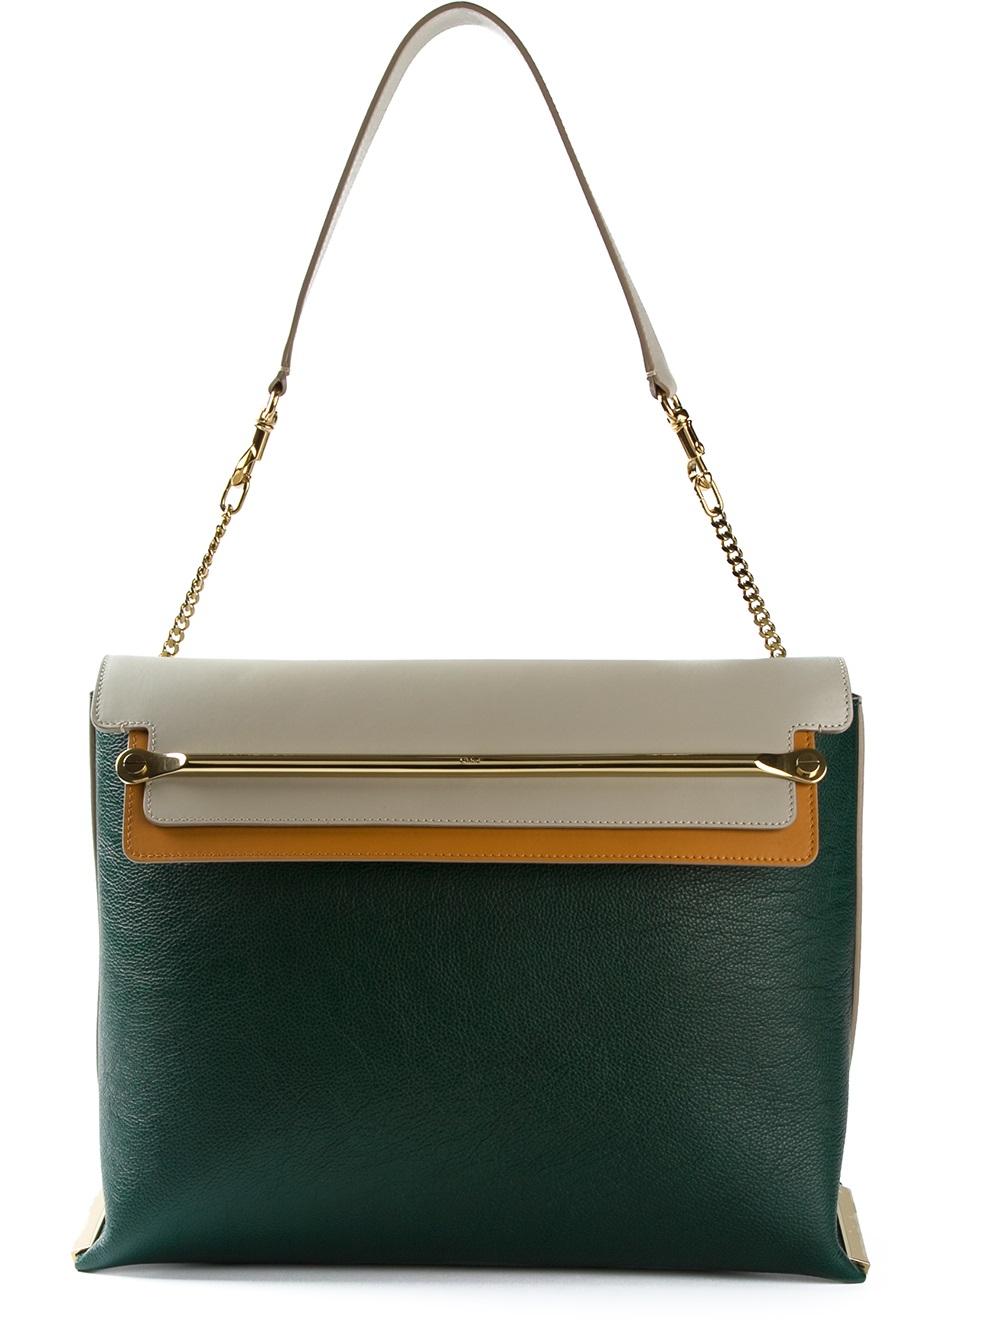 Chlo¨¦ \u0026#39;Clare\u0026#39; Shoulder Bag in Green | Lyst